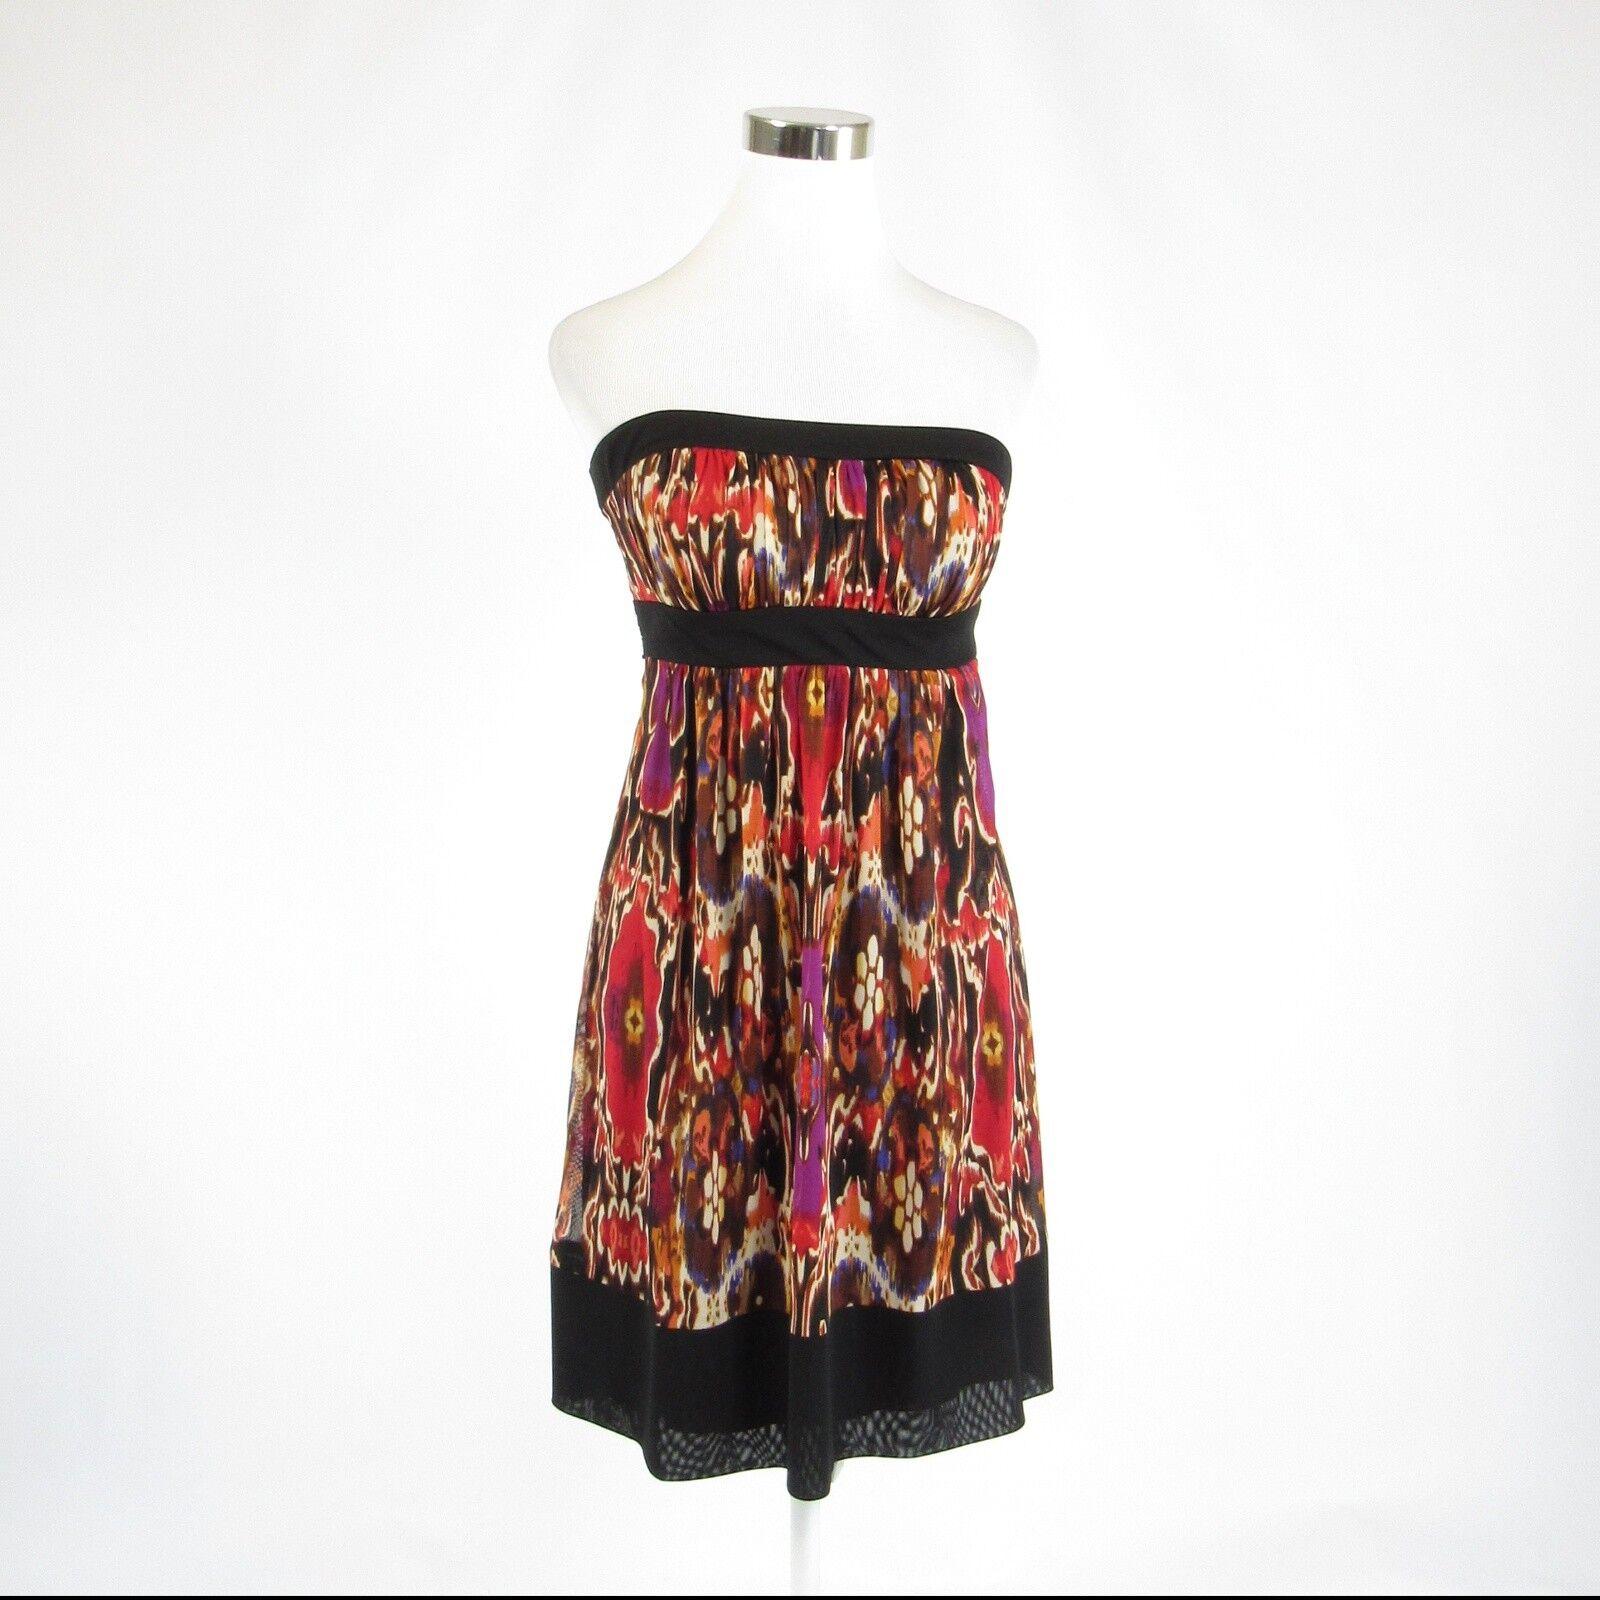 Dark brown red floral print ANTHROPOLOGIE MOULINETTE SOEURS sun dress 6